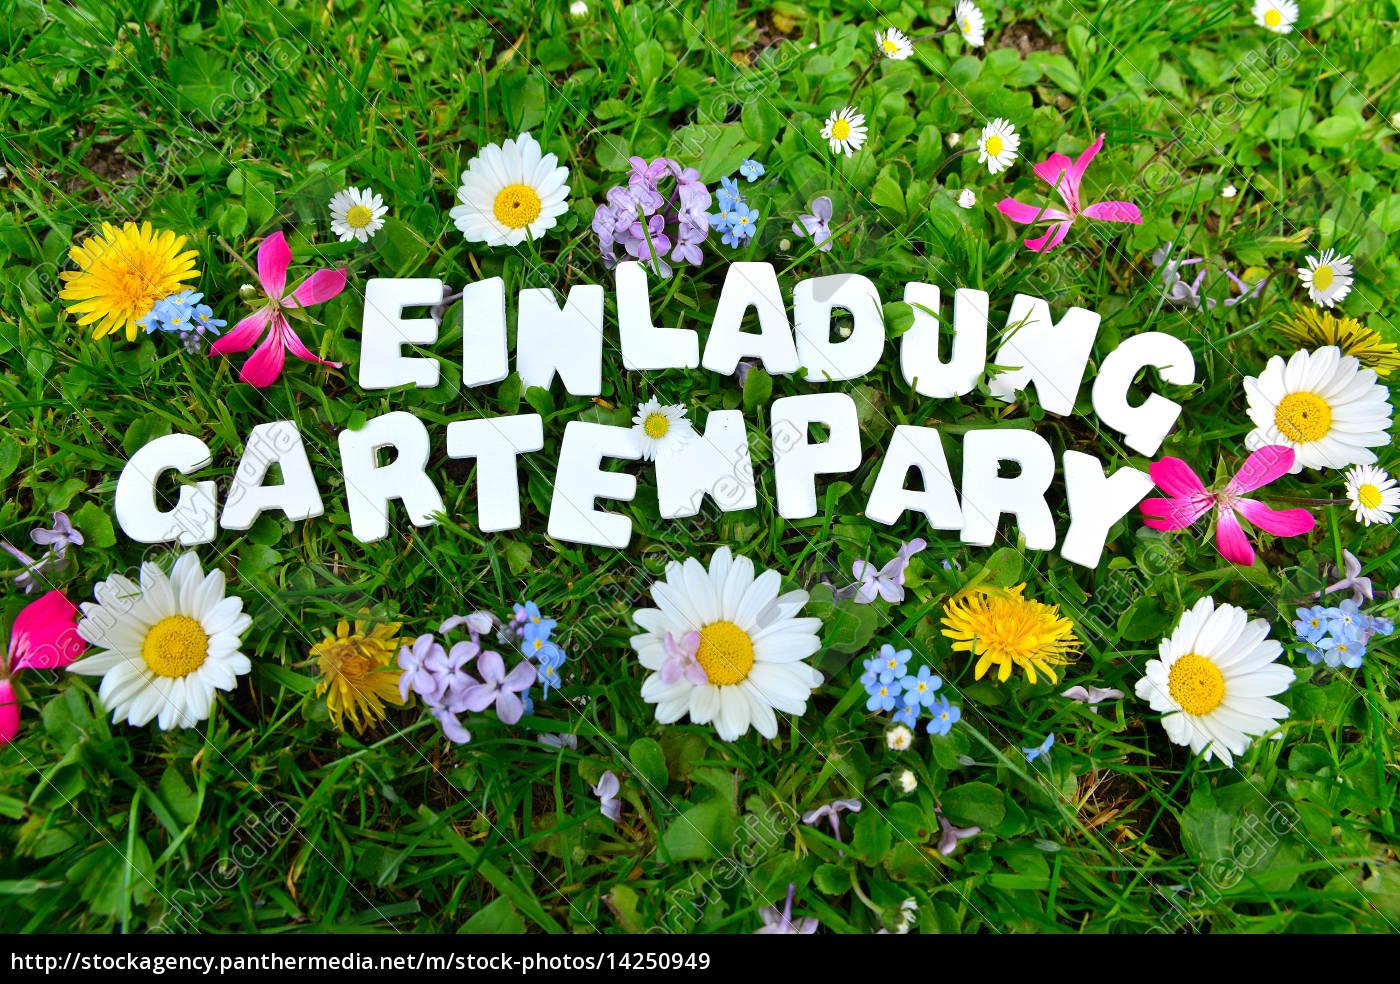 Gartenparty Gartenfest Text Lizenzfreies Bild 14250949